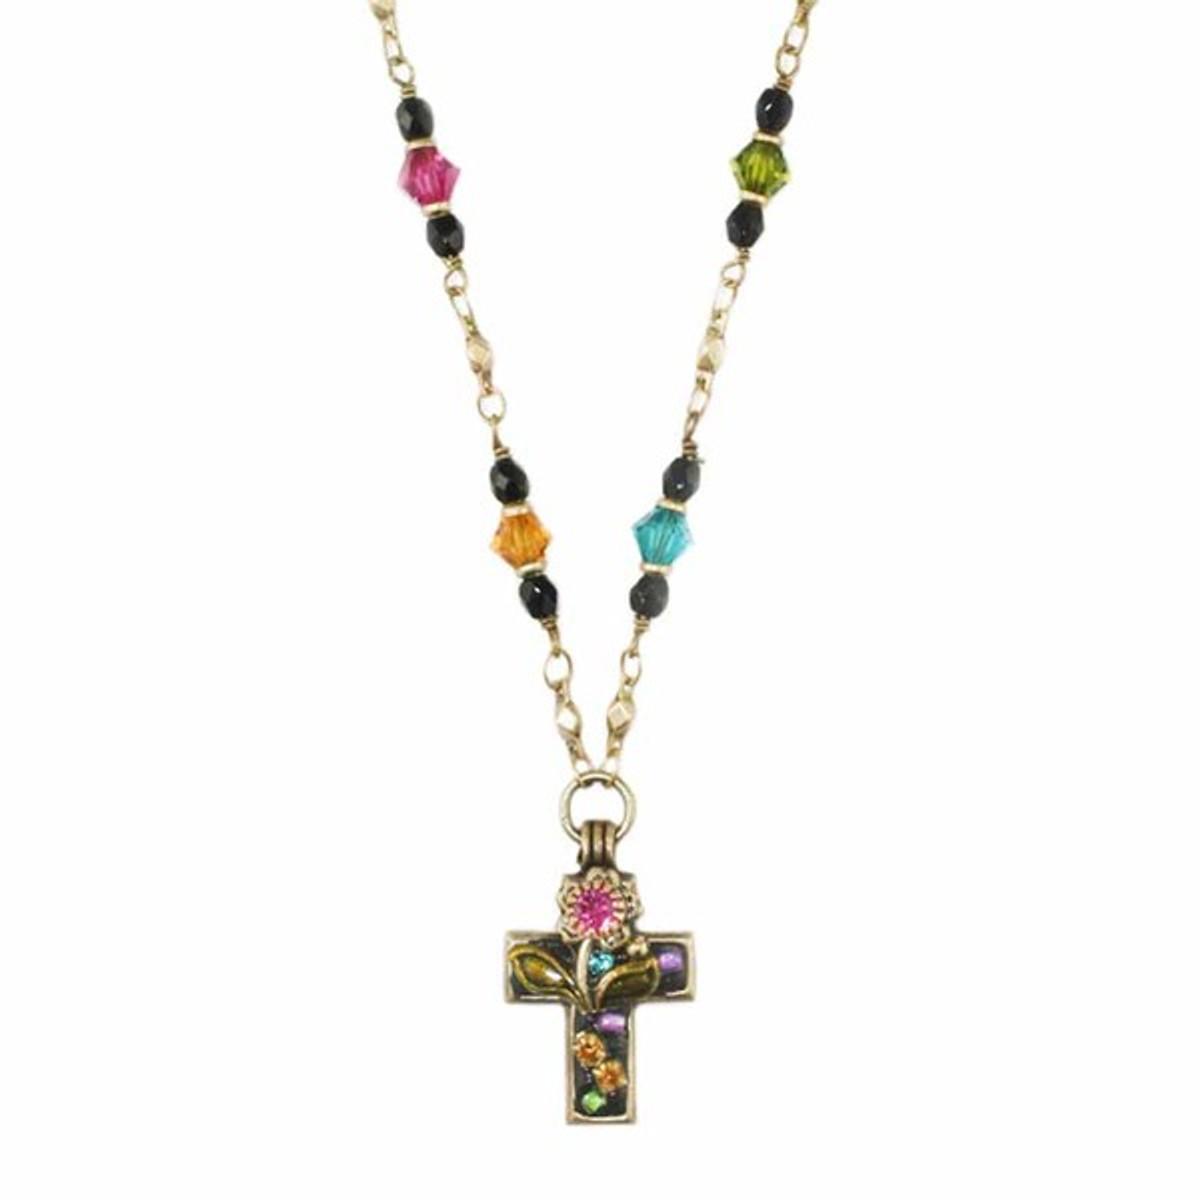 Night Garden Cross Necklace